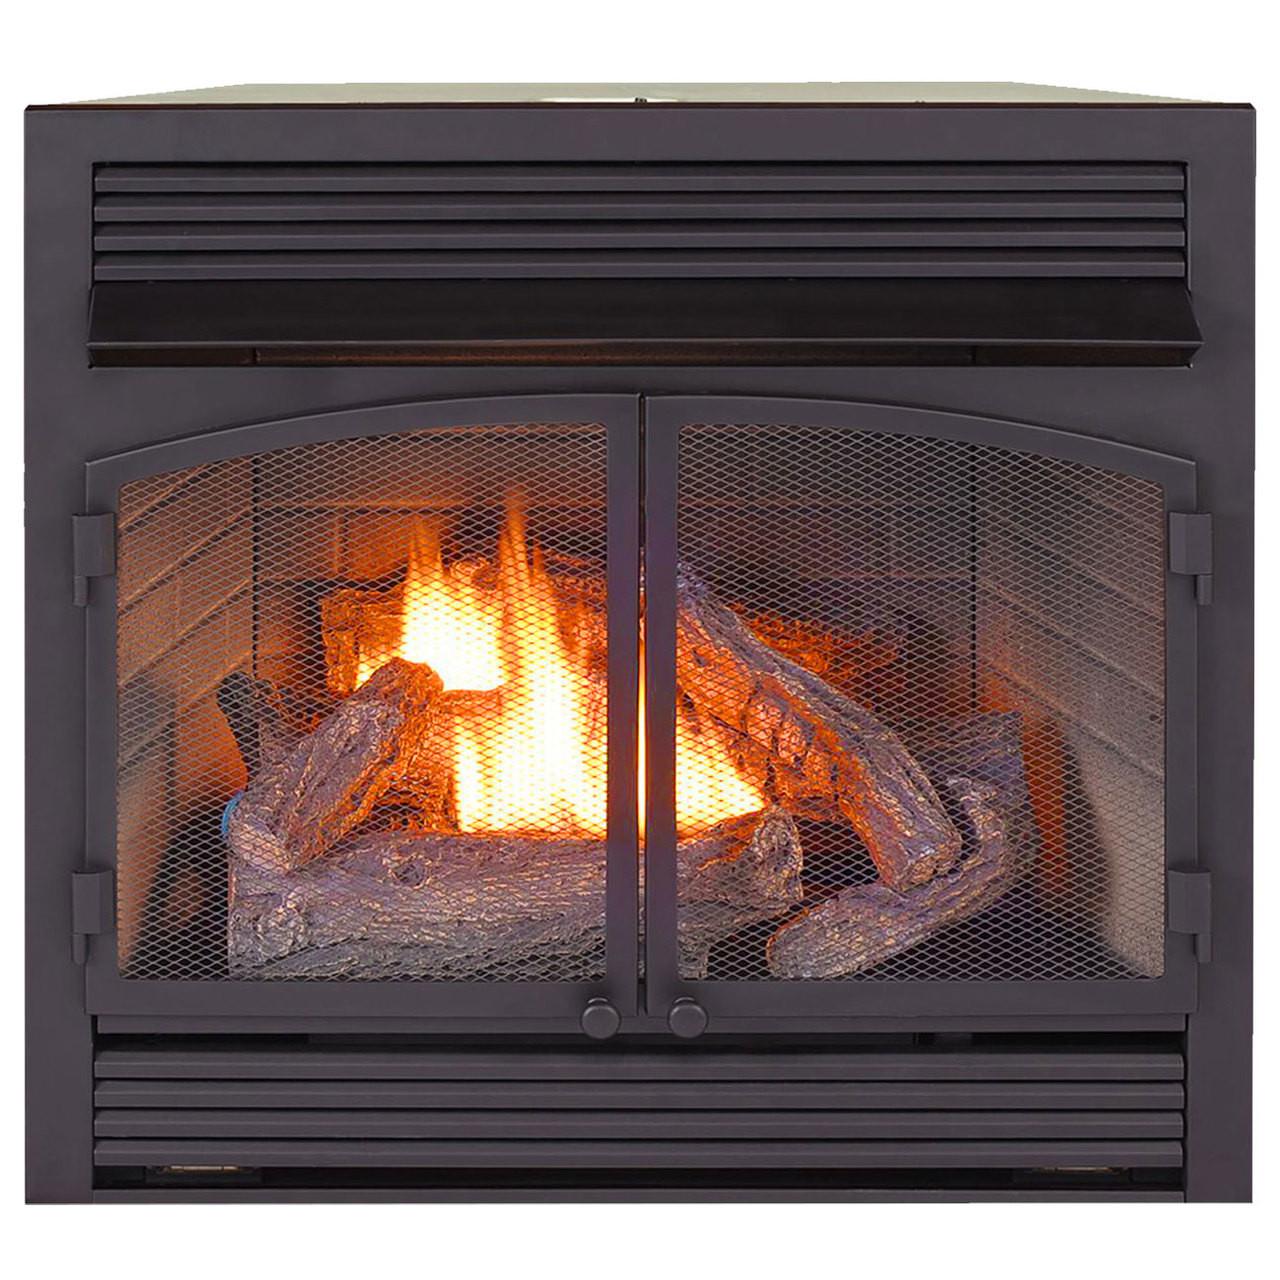 Procom Heating Dual Fuel Ventless Fireplace Insert 32 000 Btu